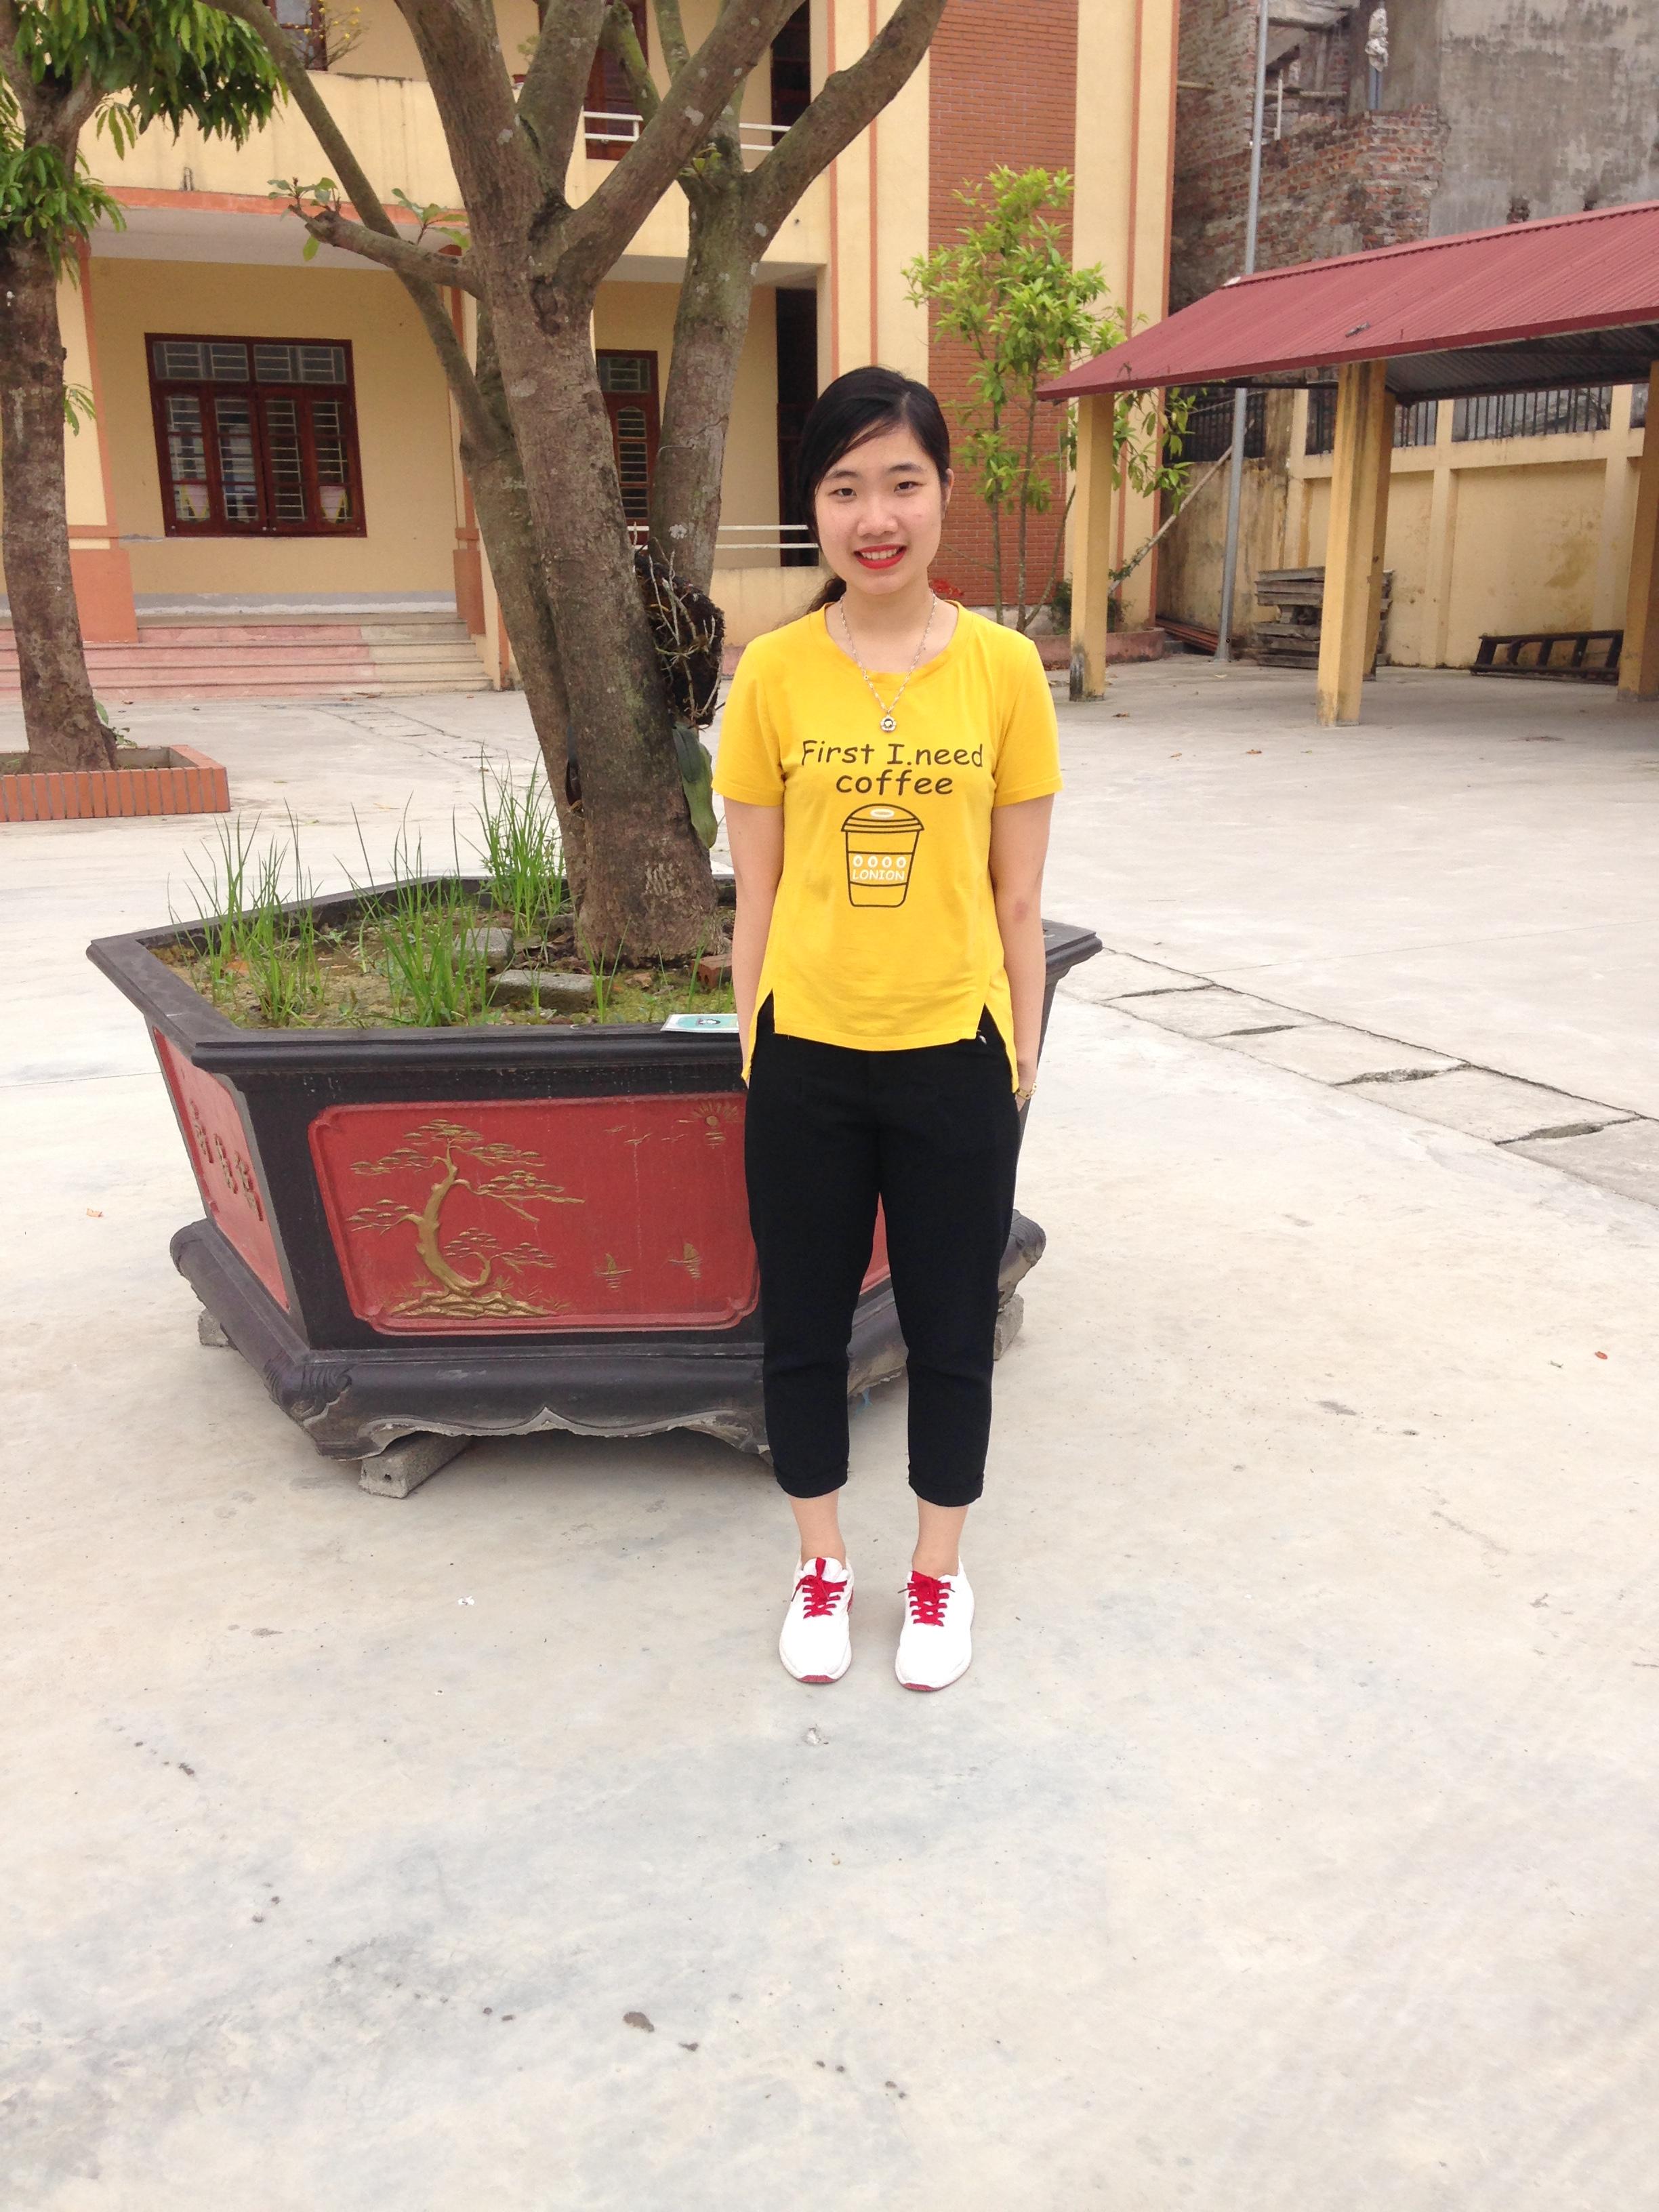 AUSTRUI_HOANG Thi Hien